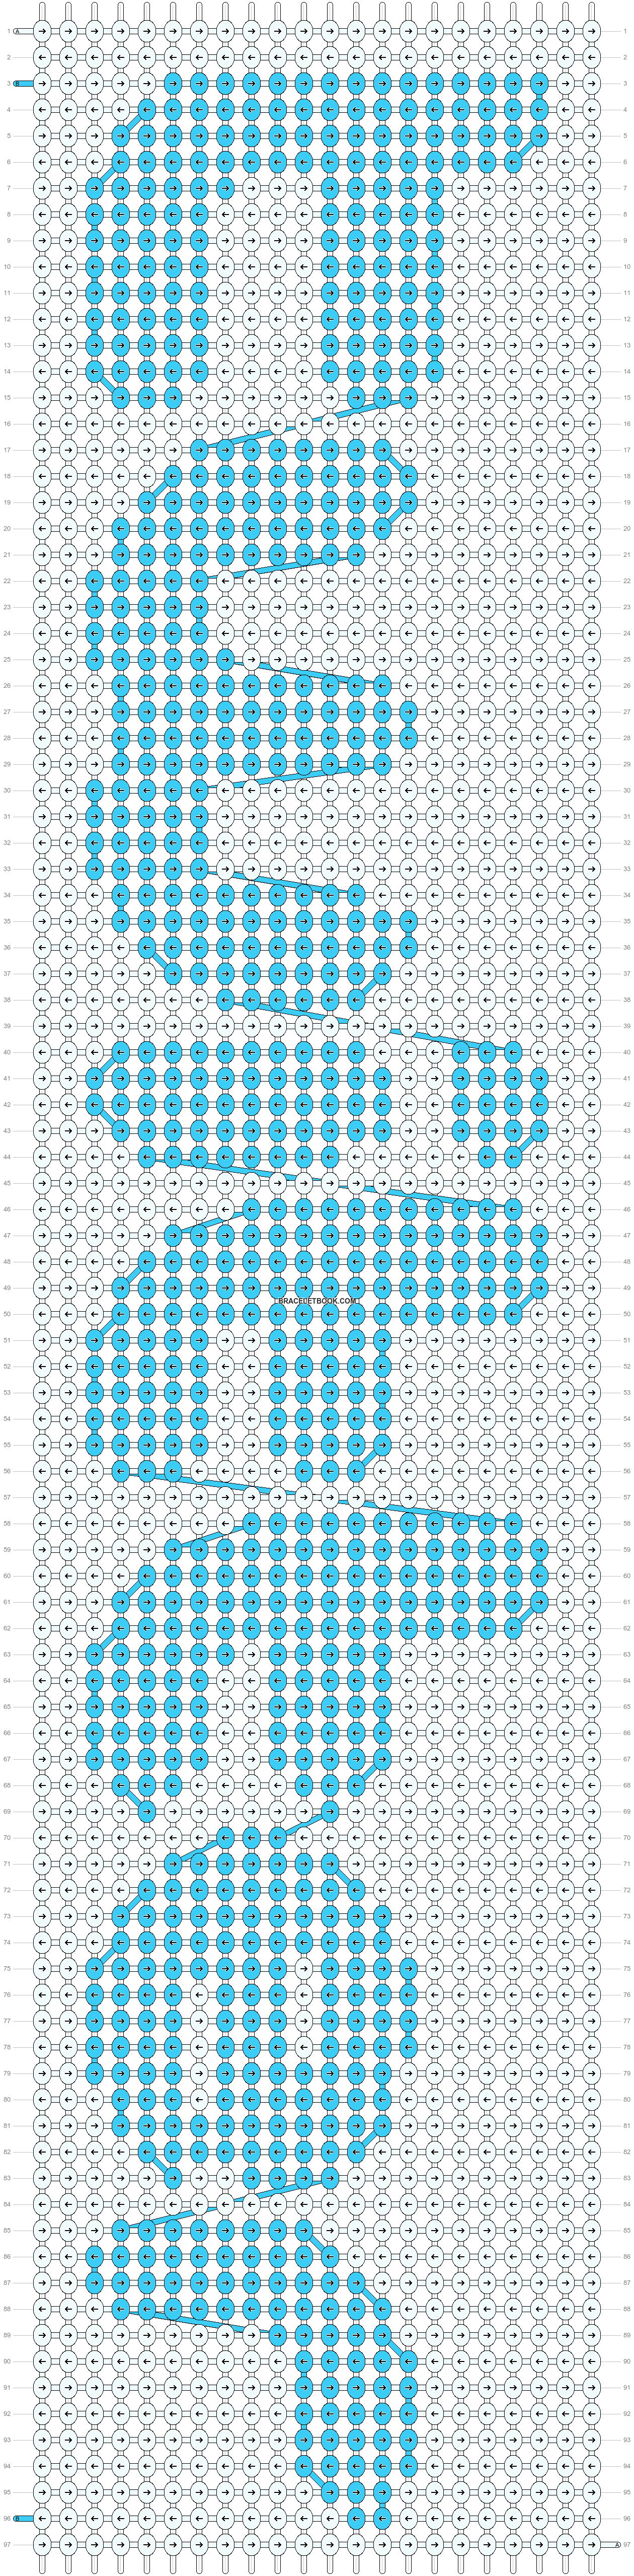 Alpha Pattern #7431 added by queenbee